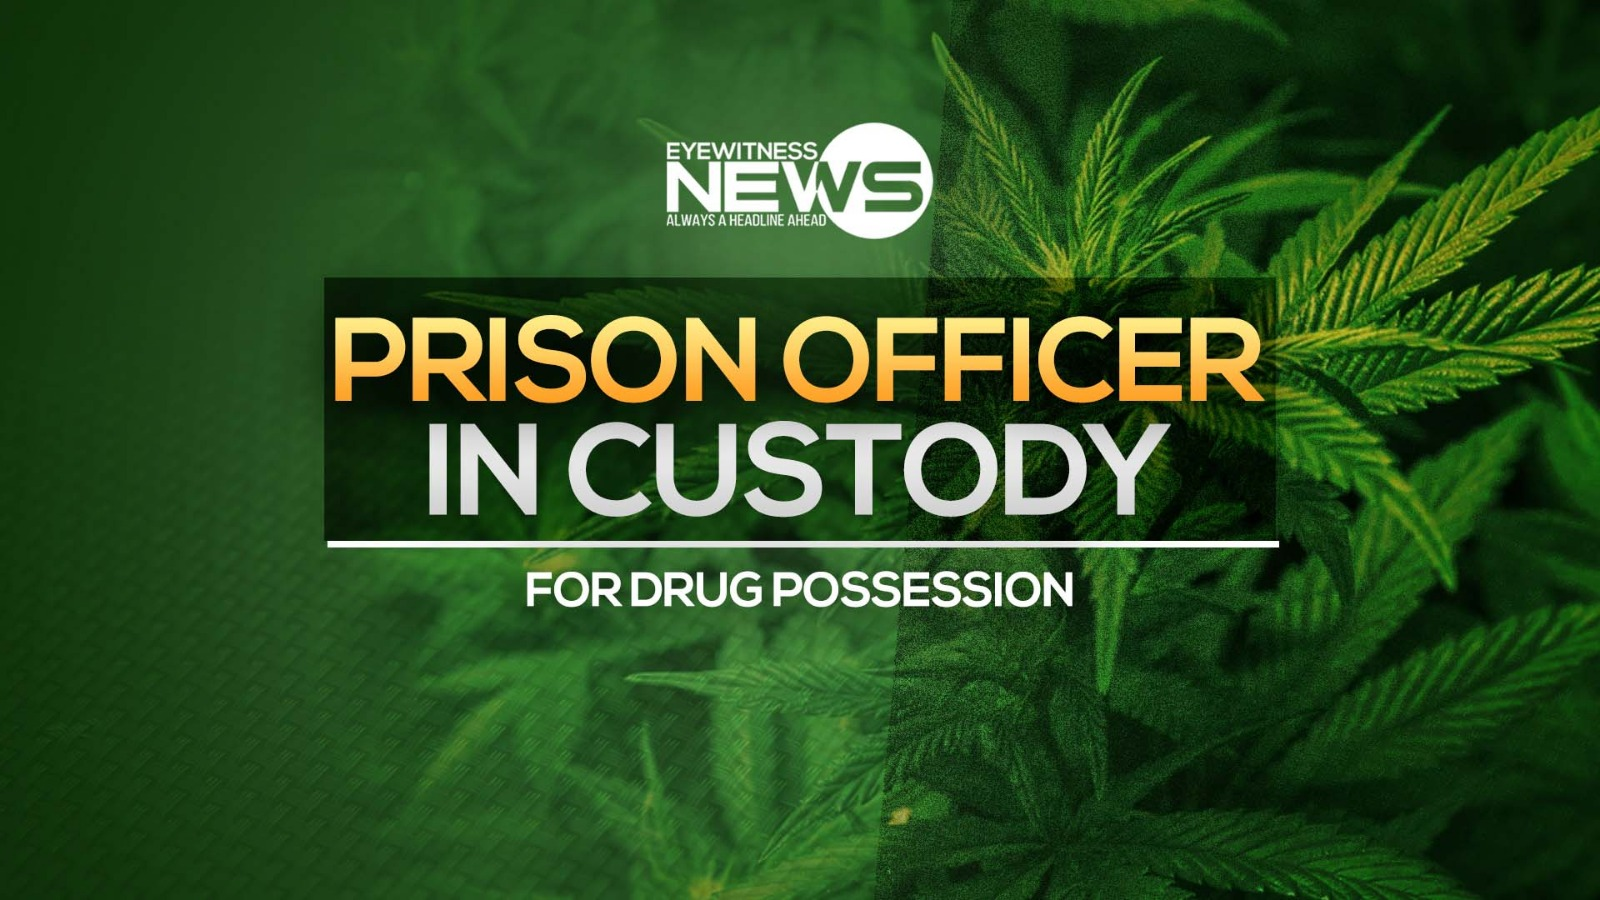 Prison officer on remand for drug charges